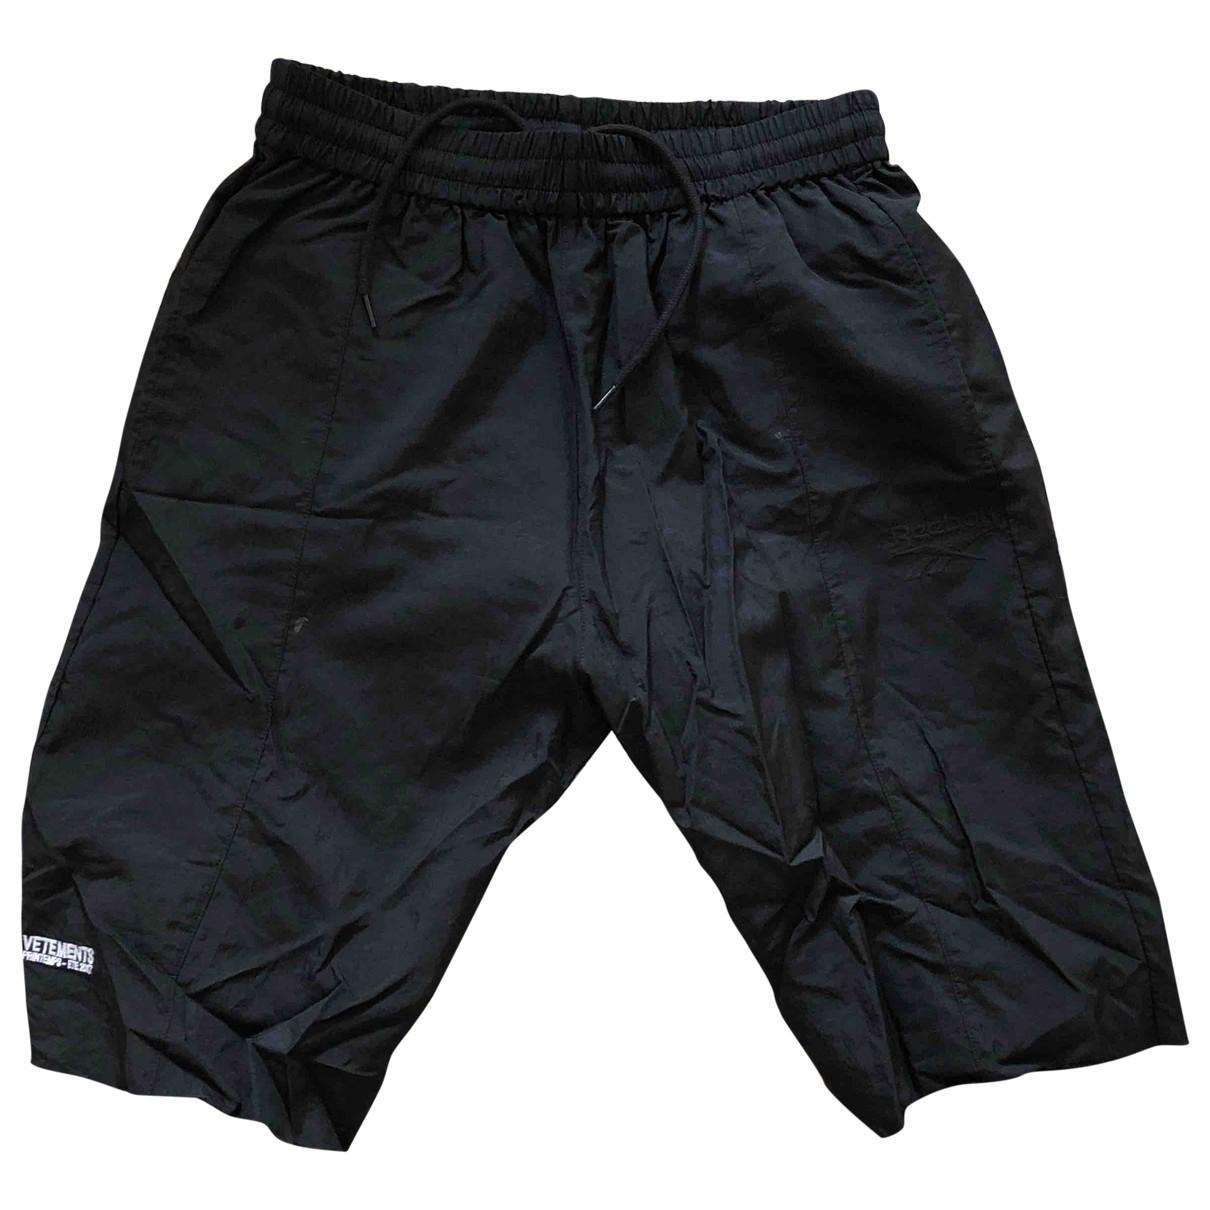 Reebok X Vetements \N Shorts in  Schwarz Polyester